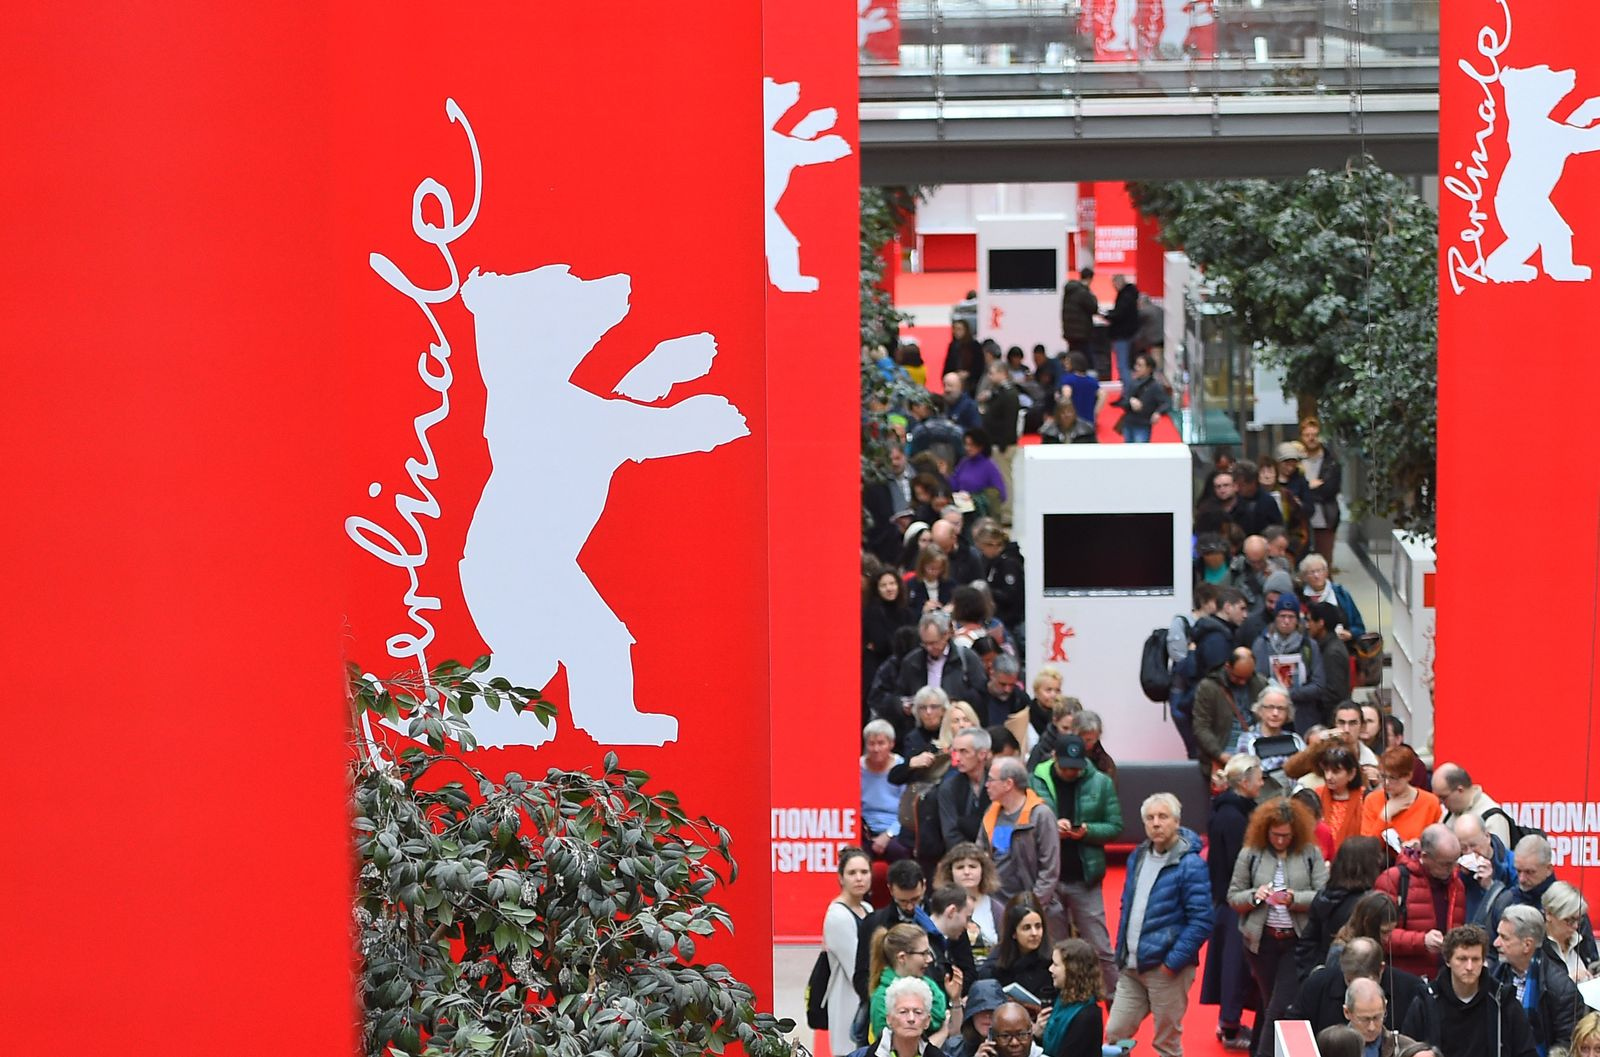 70. Berlinale - Beginn Karten-Vorverkauf